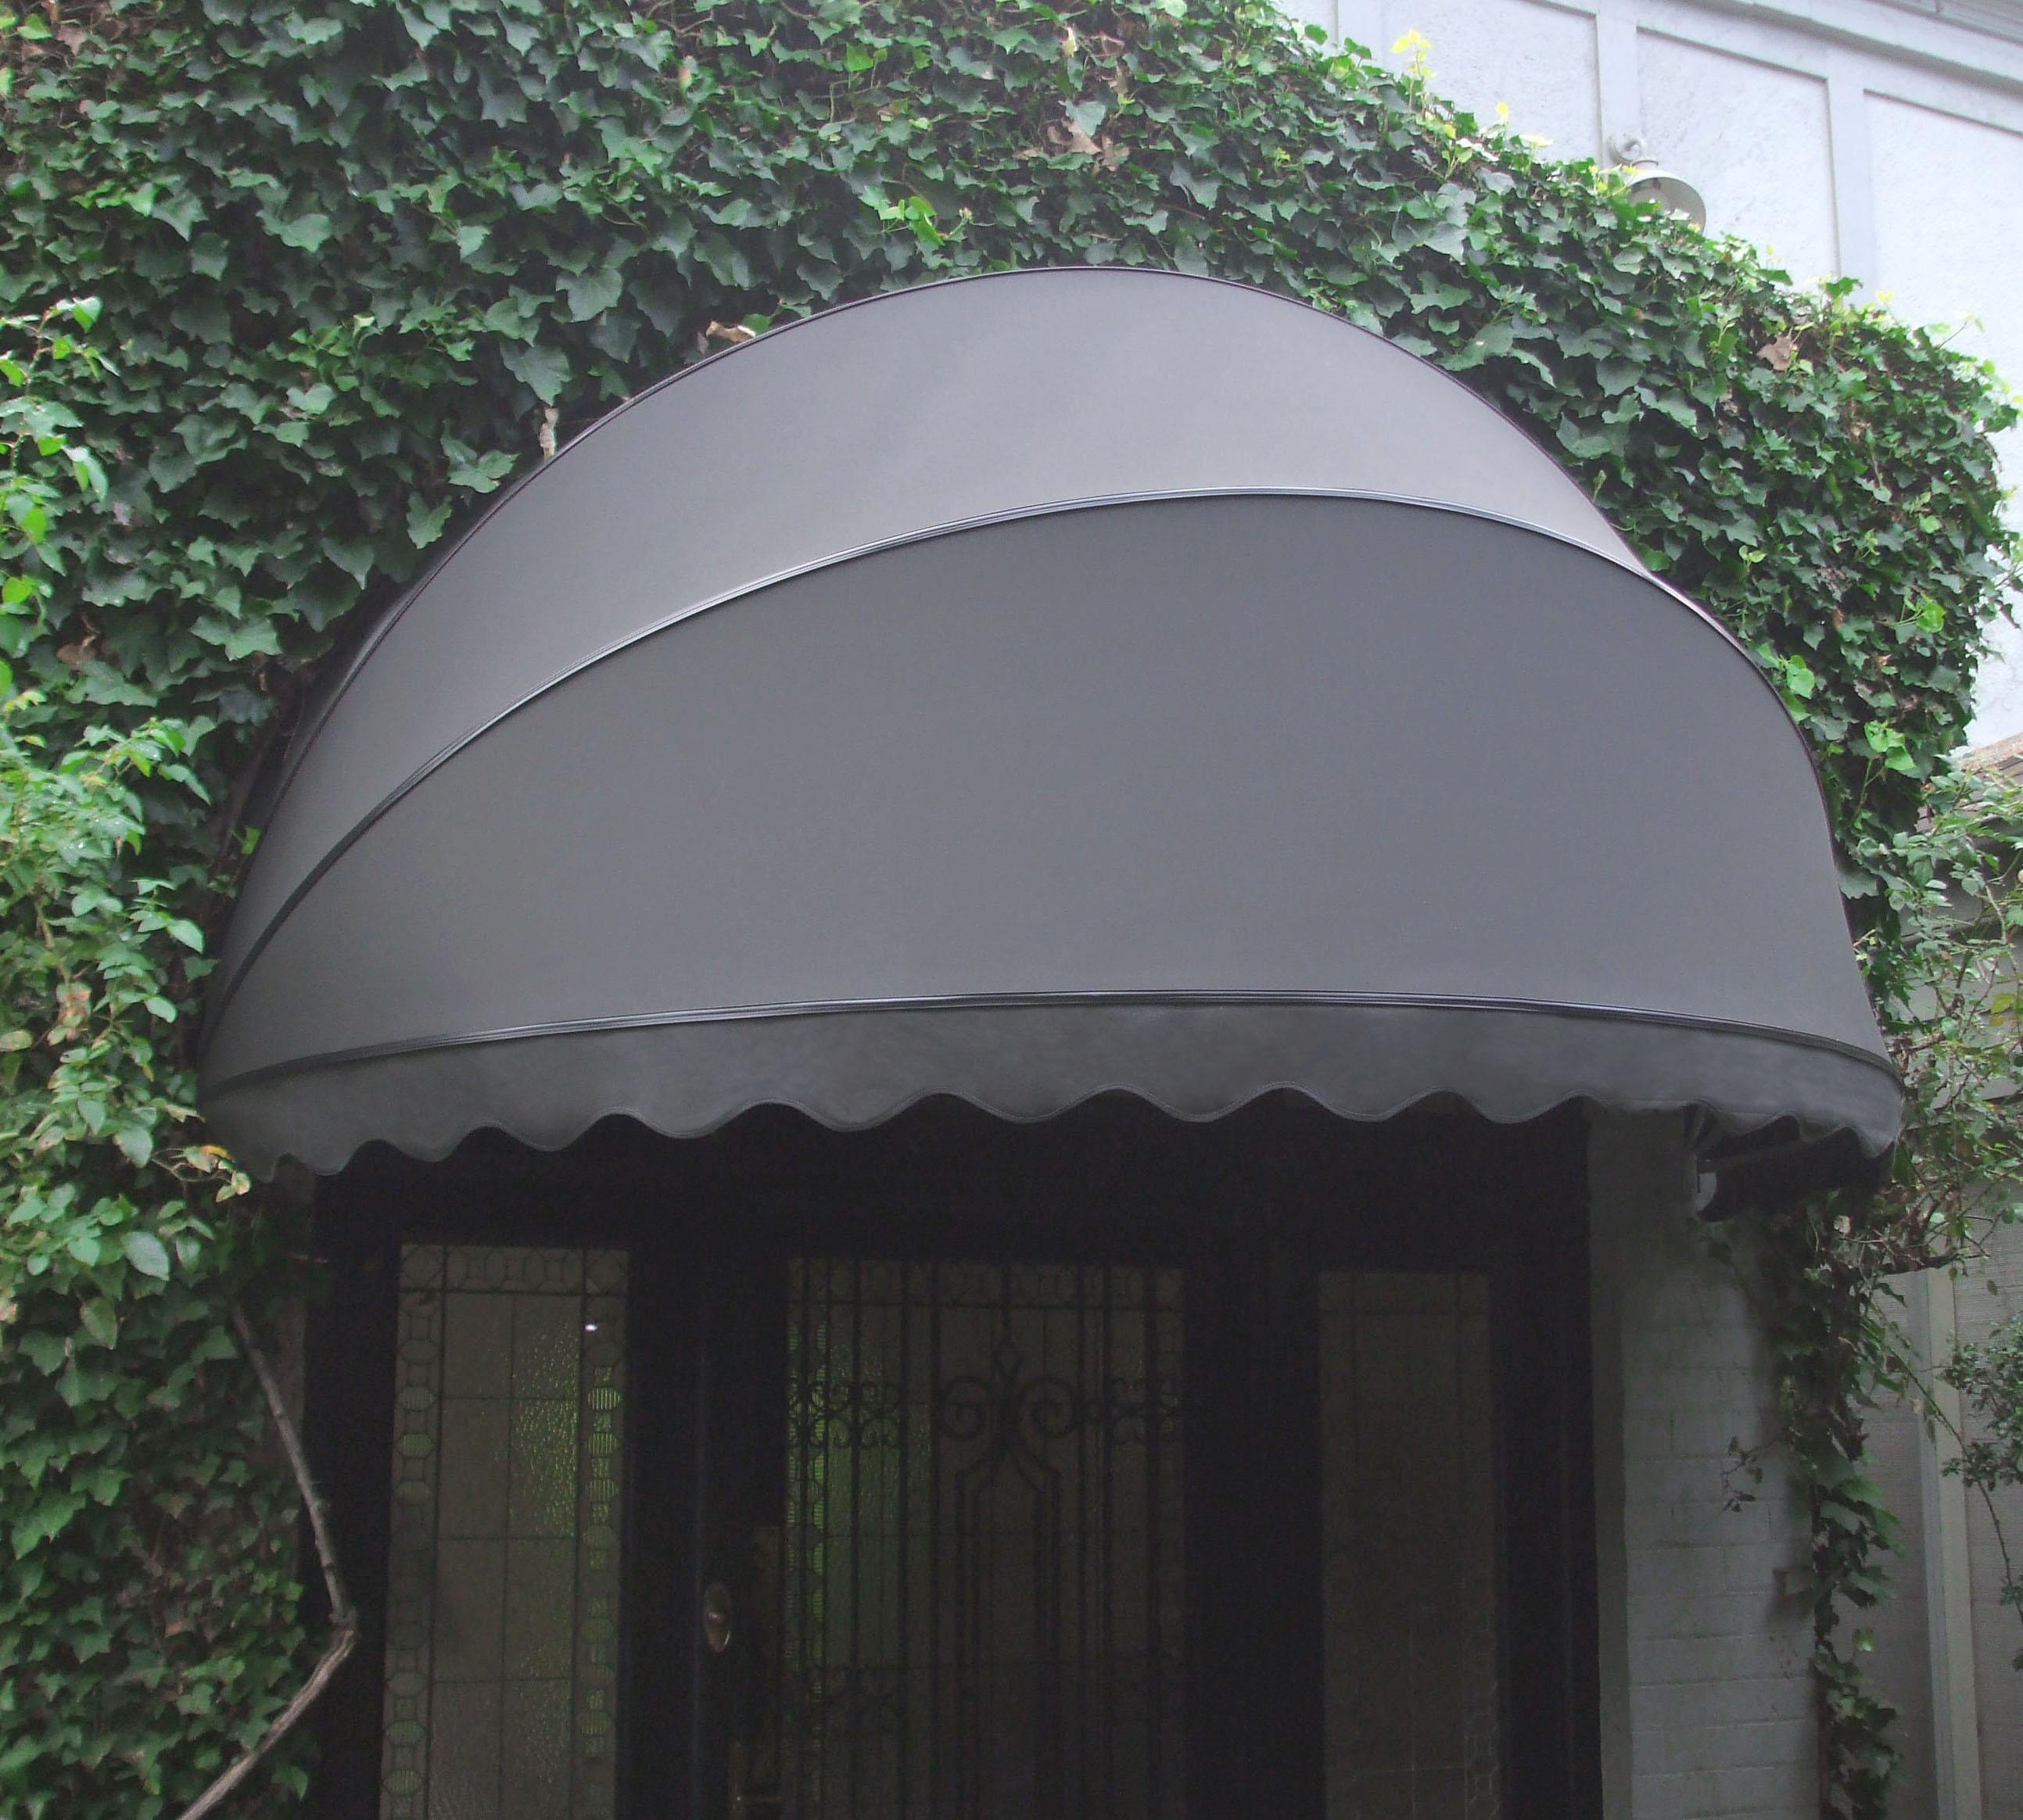 Dutch Hood Canopies